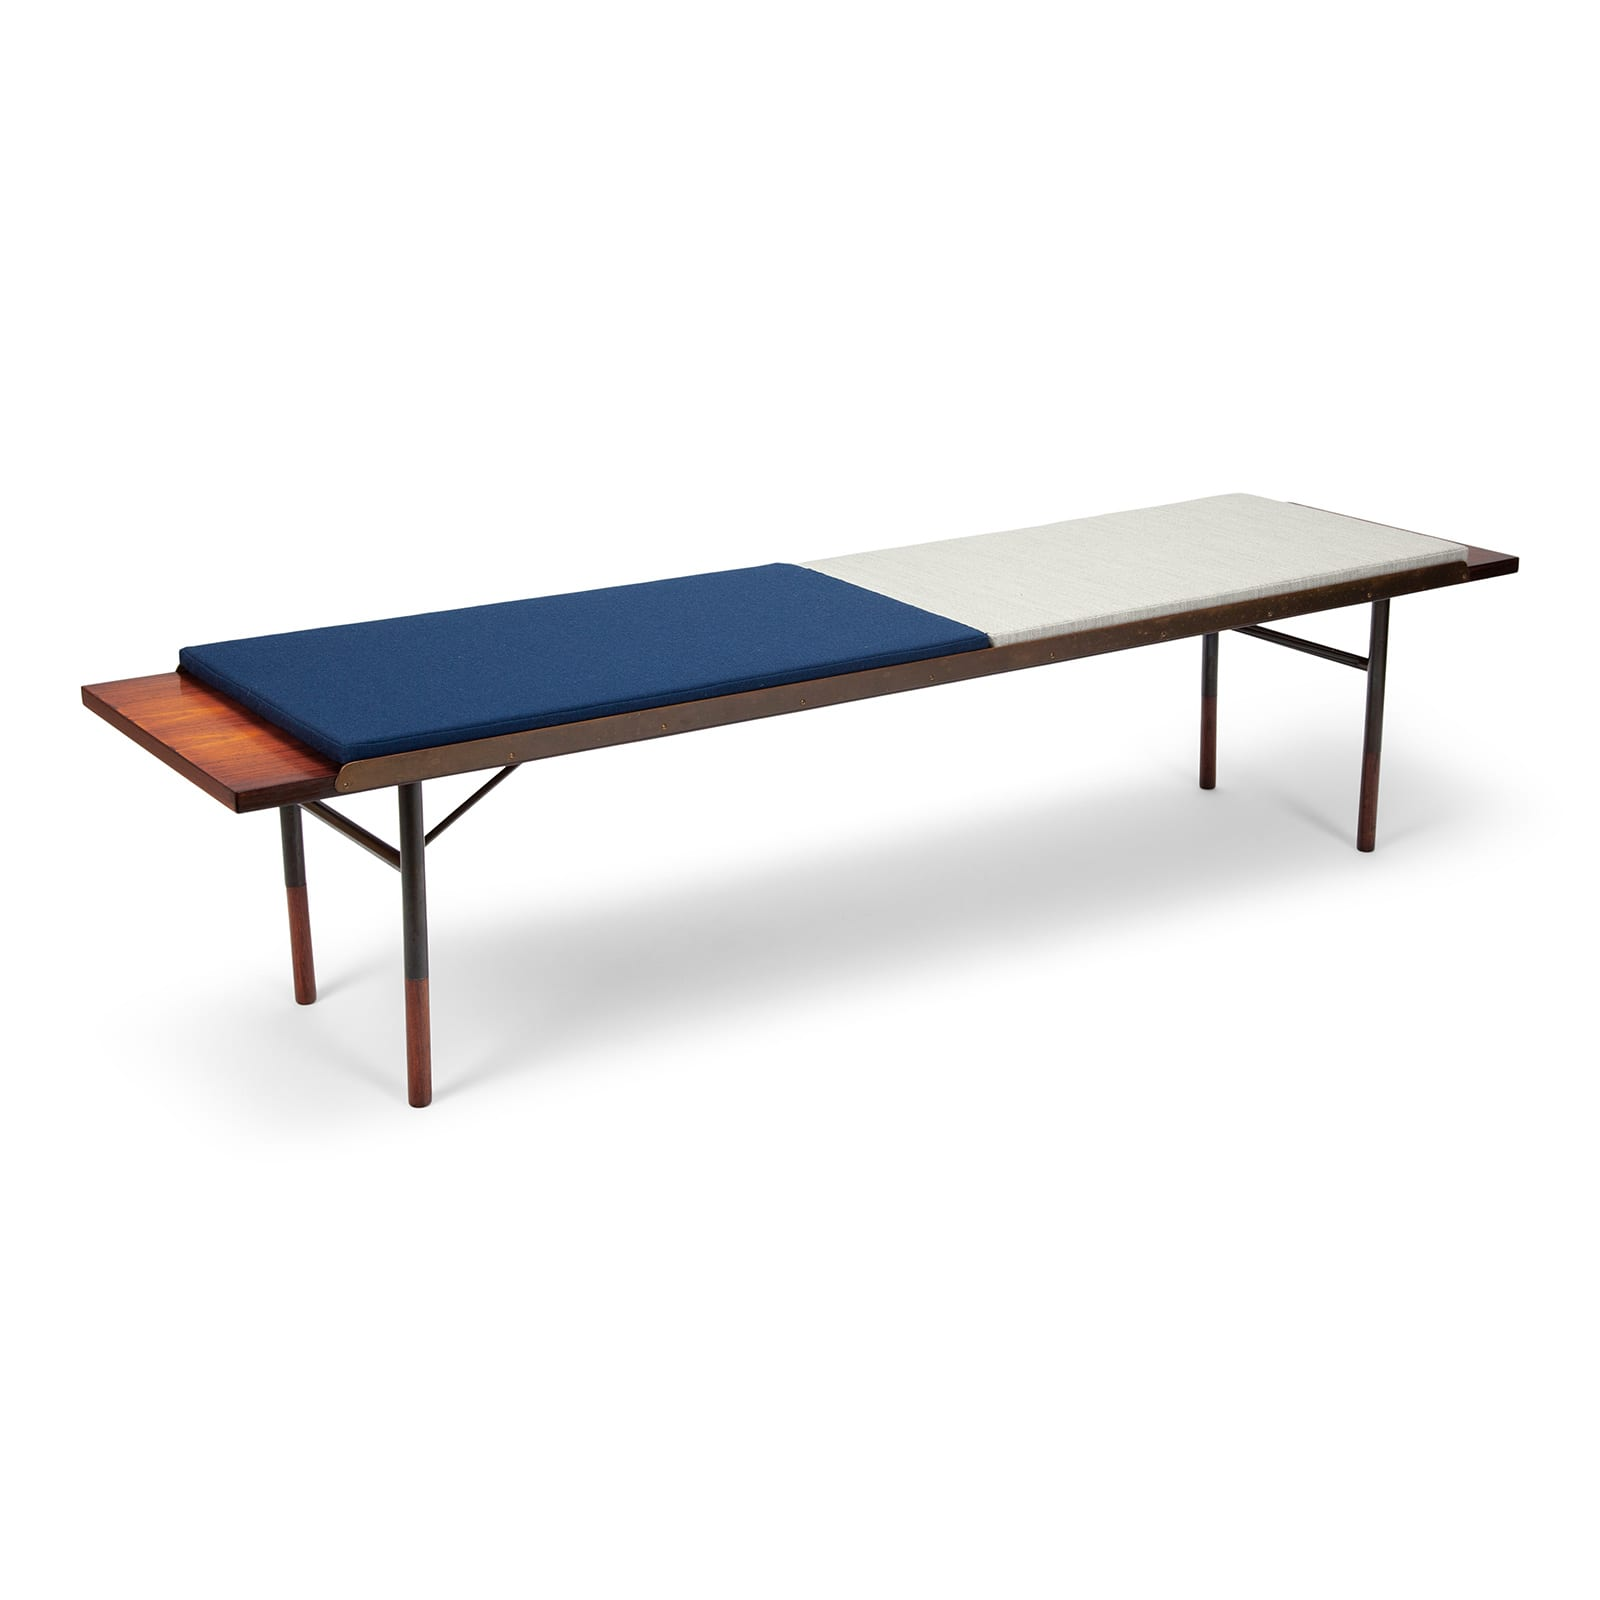 A table bench, model BO101